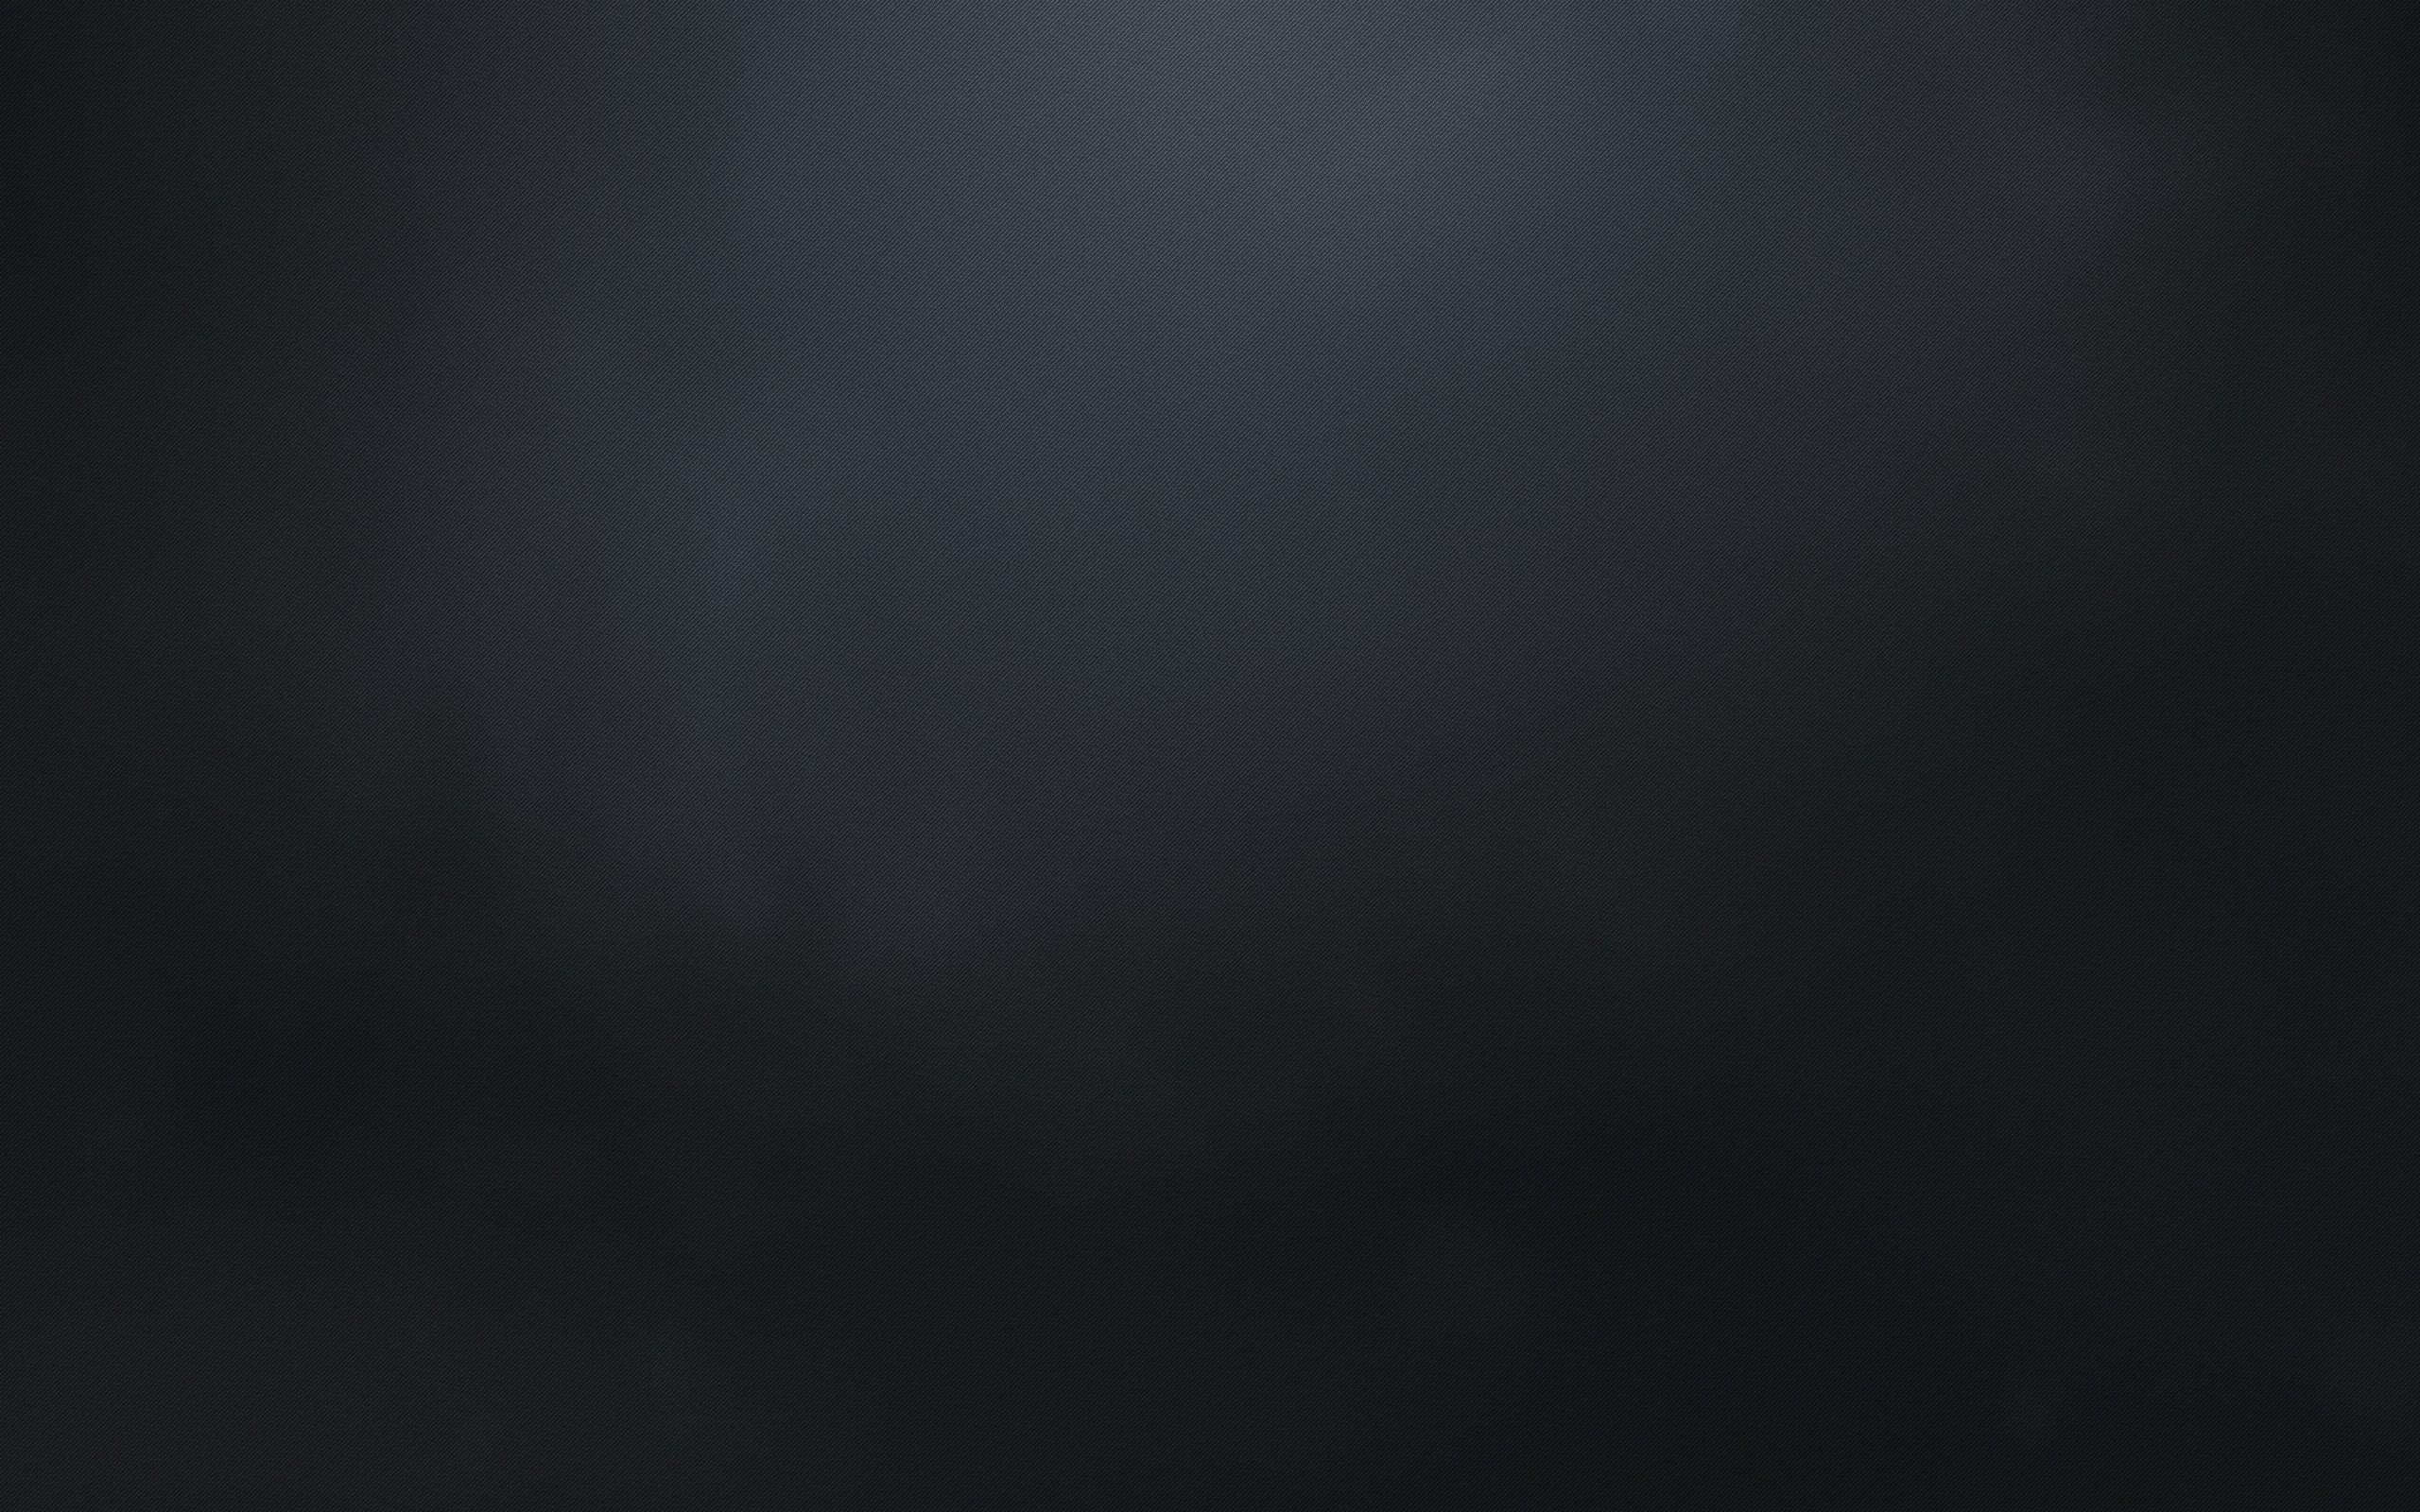 Solid Black Color Images Color Mean Chart Splash 2560×1600